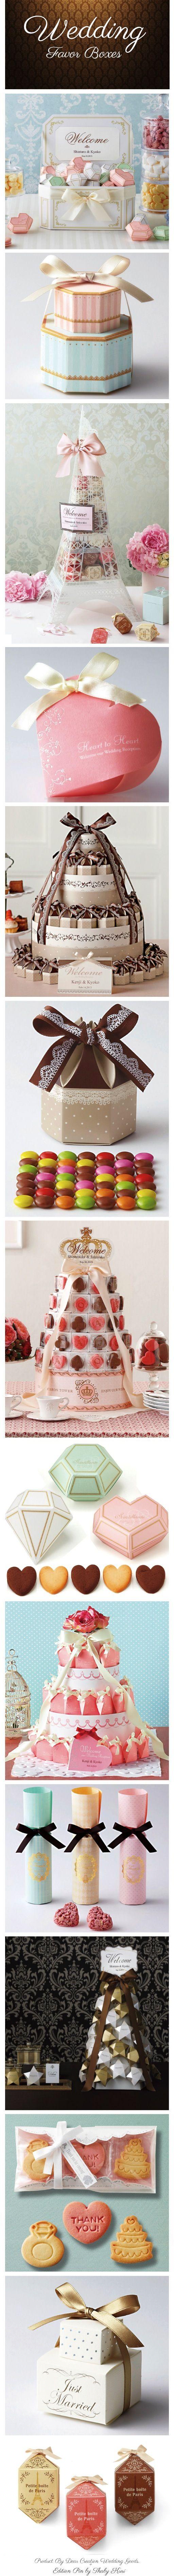 So cute...Wedding Favor Boxes. By Dear Creation Japon. #Packaging #wedding